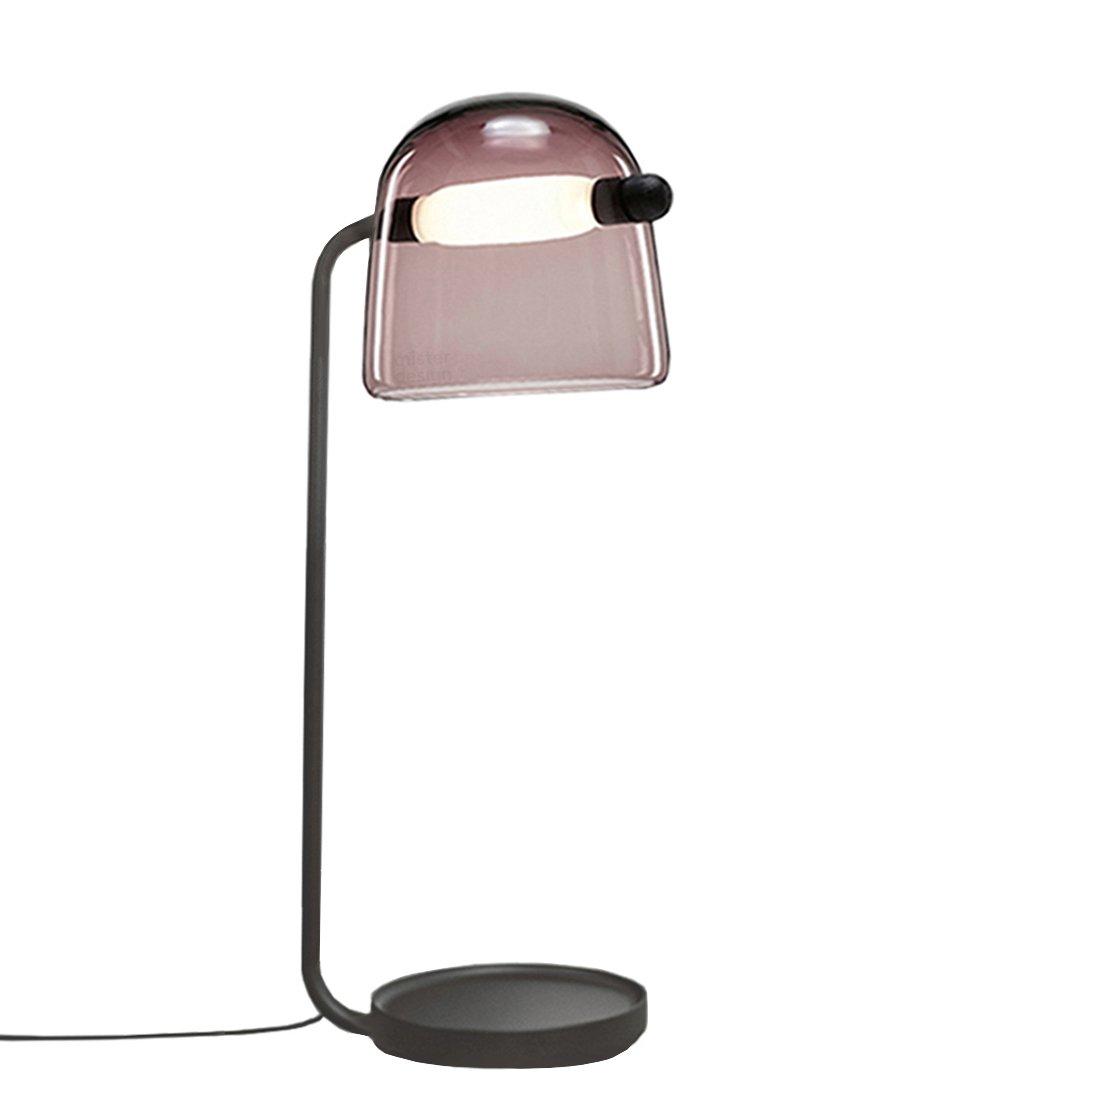 Brokis Mona Vloerlamp Large Violet - Zwarte Body